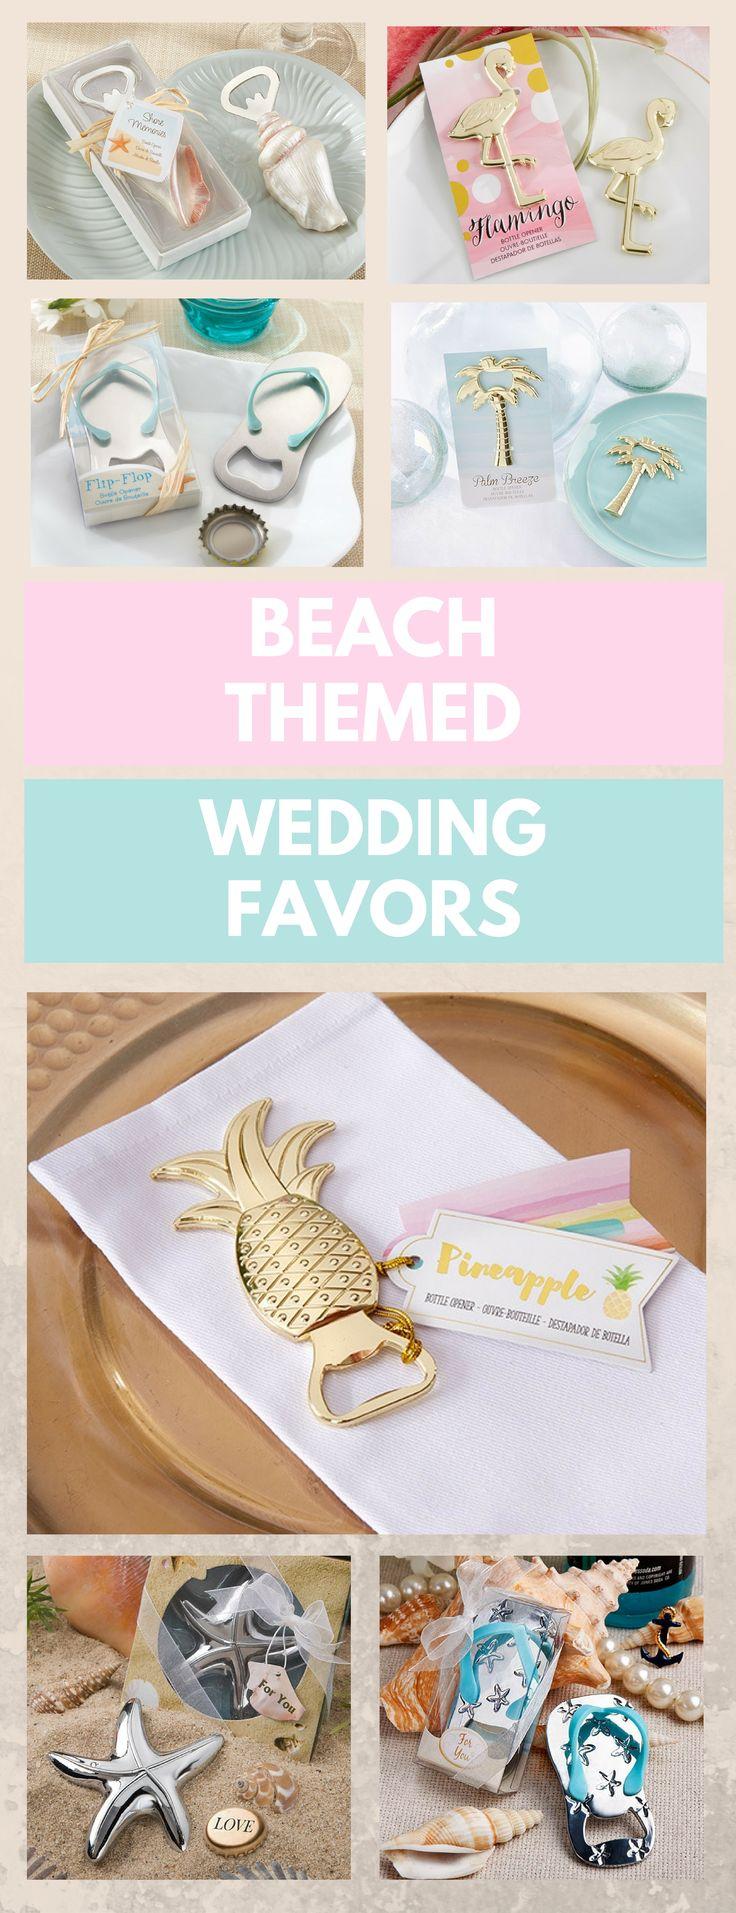 These beach theme wedding favors